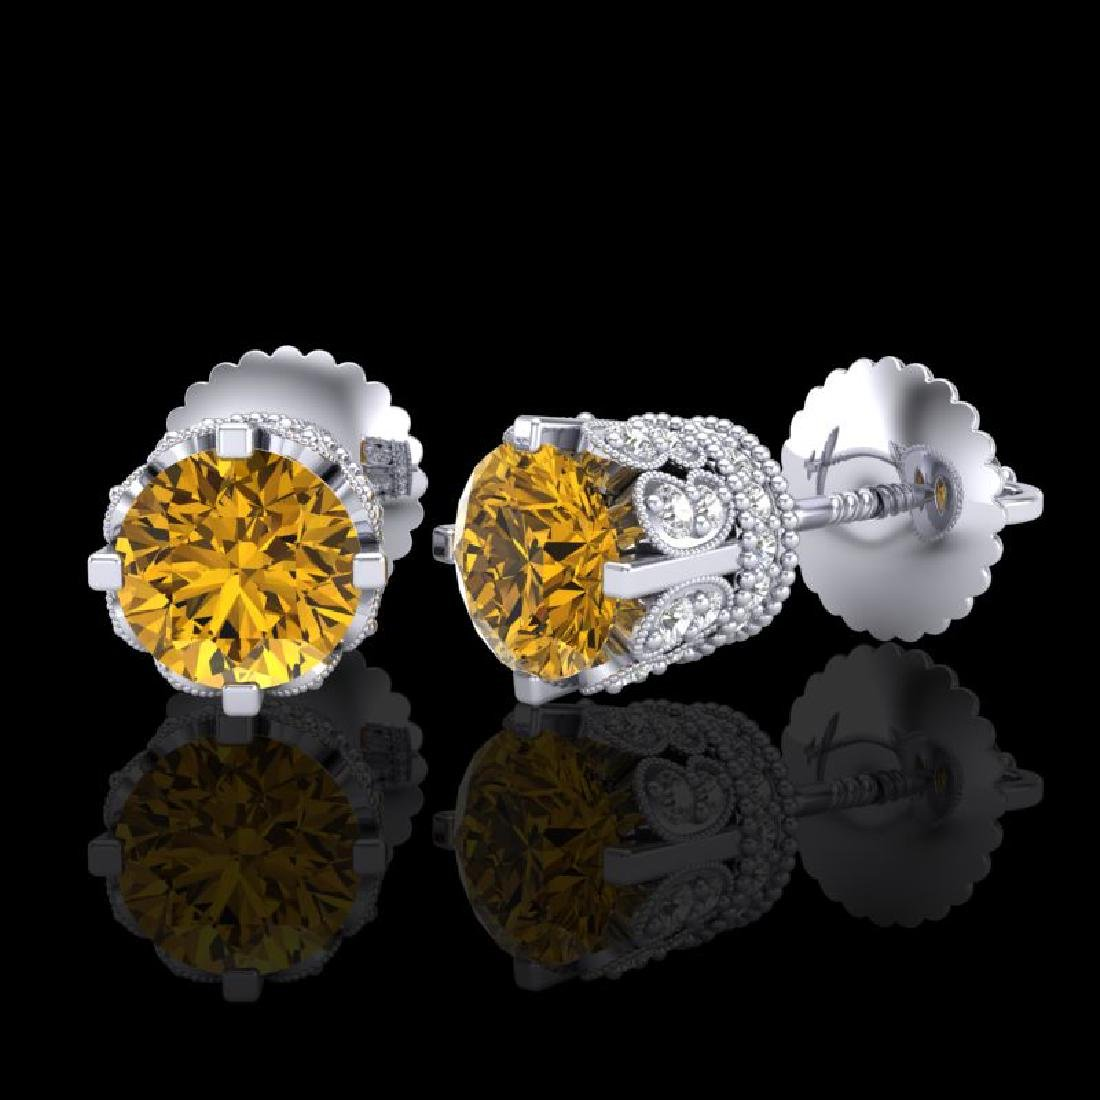 1.75 CTW Intense Fancy Yellow Diamond Art Deco Stud - 2